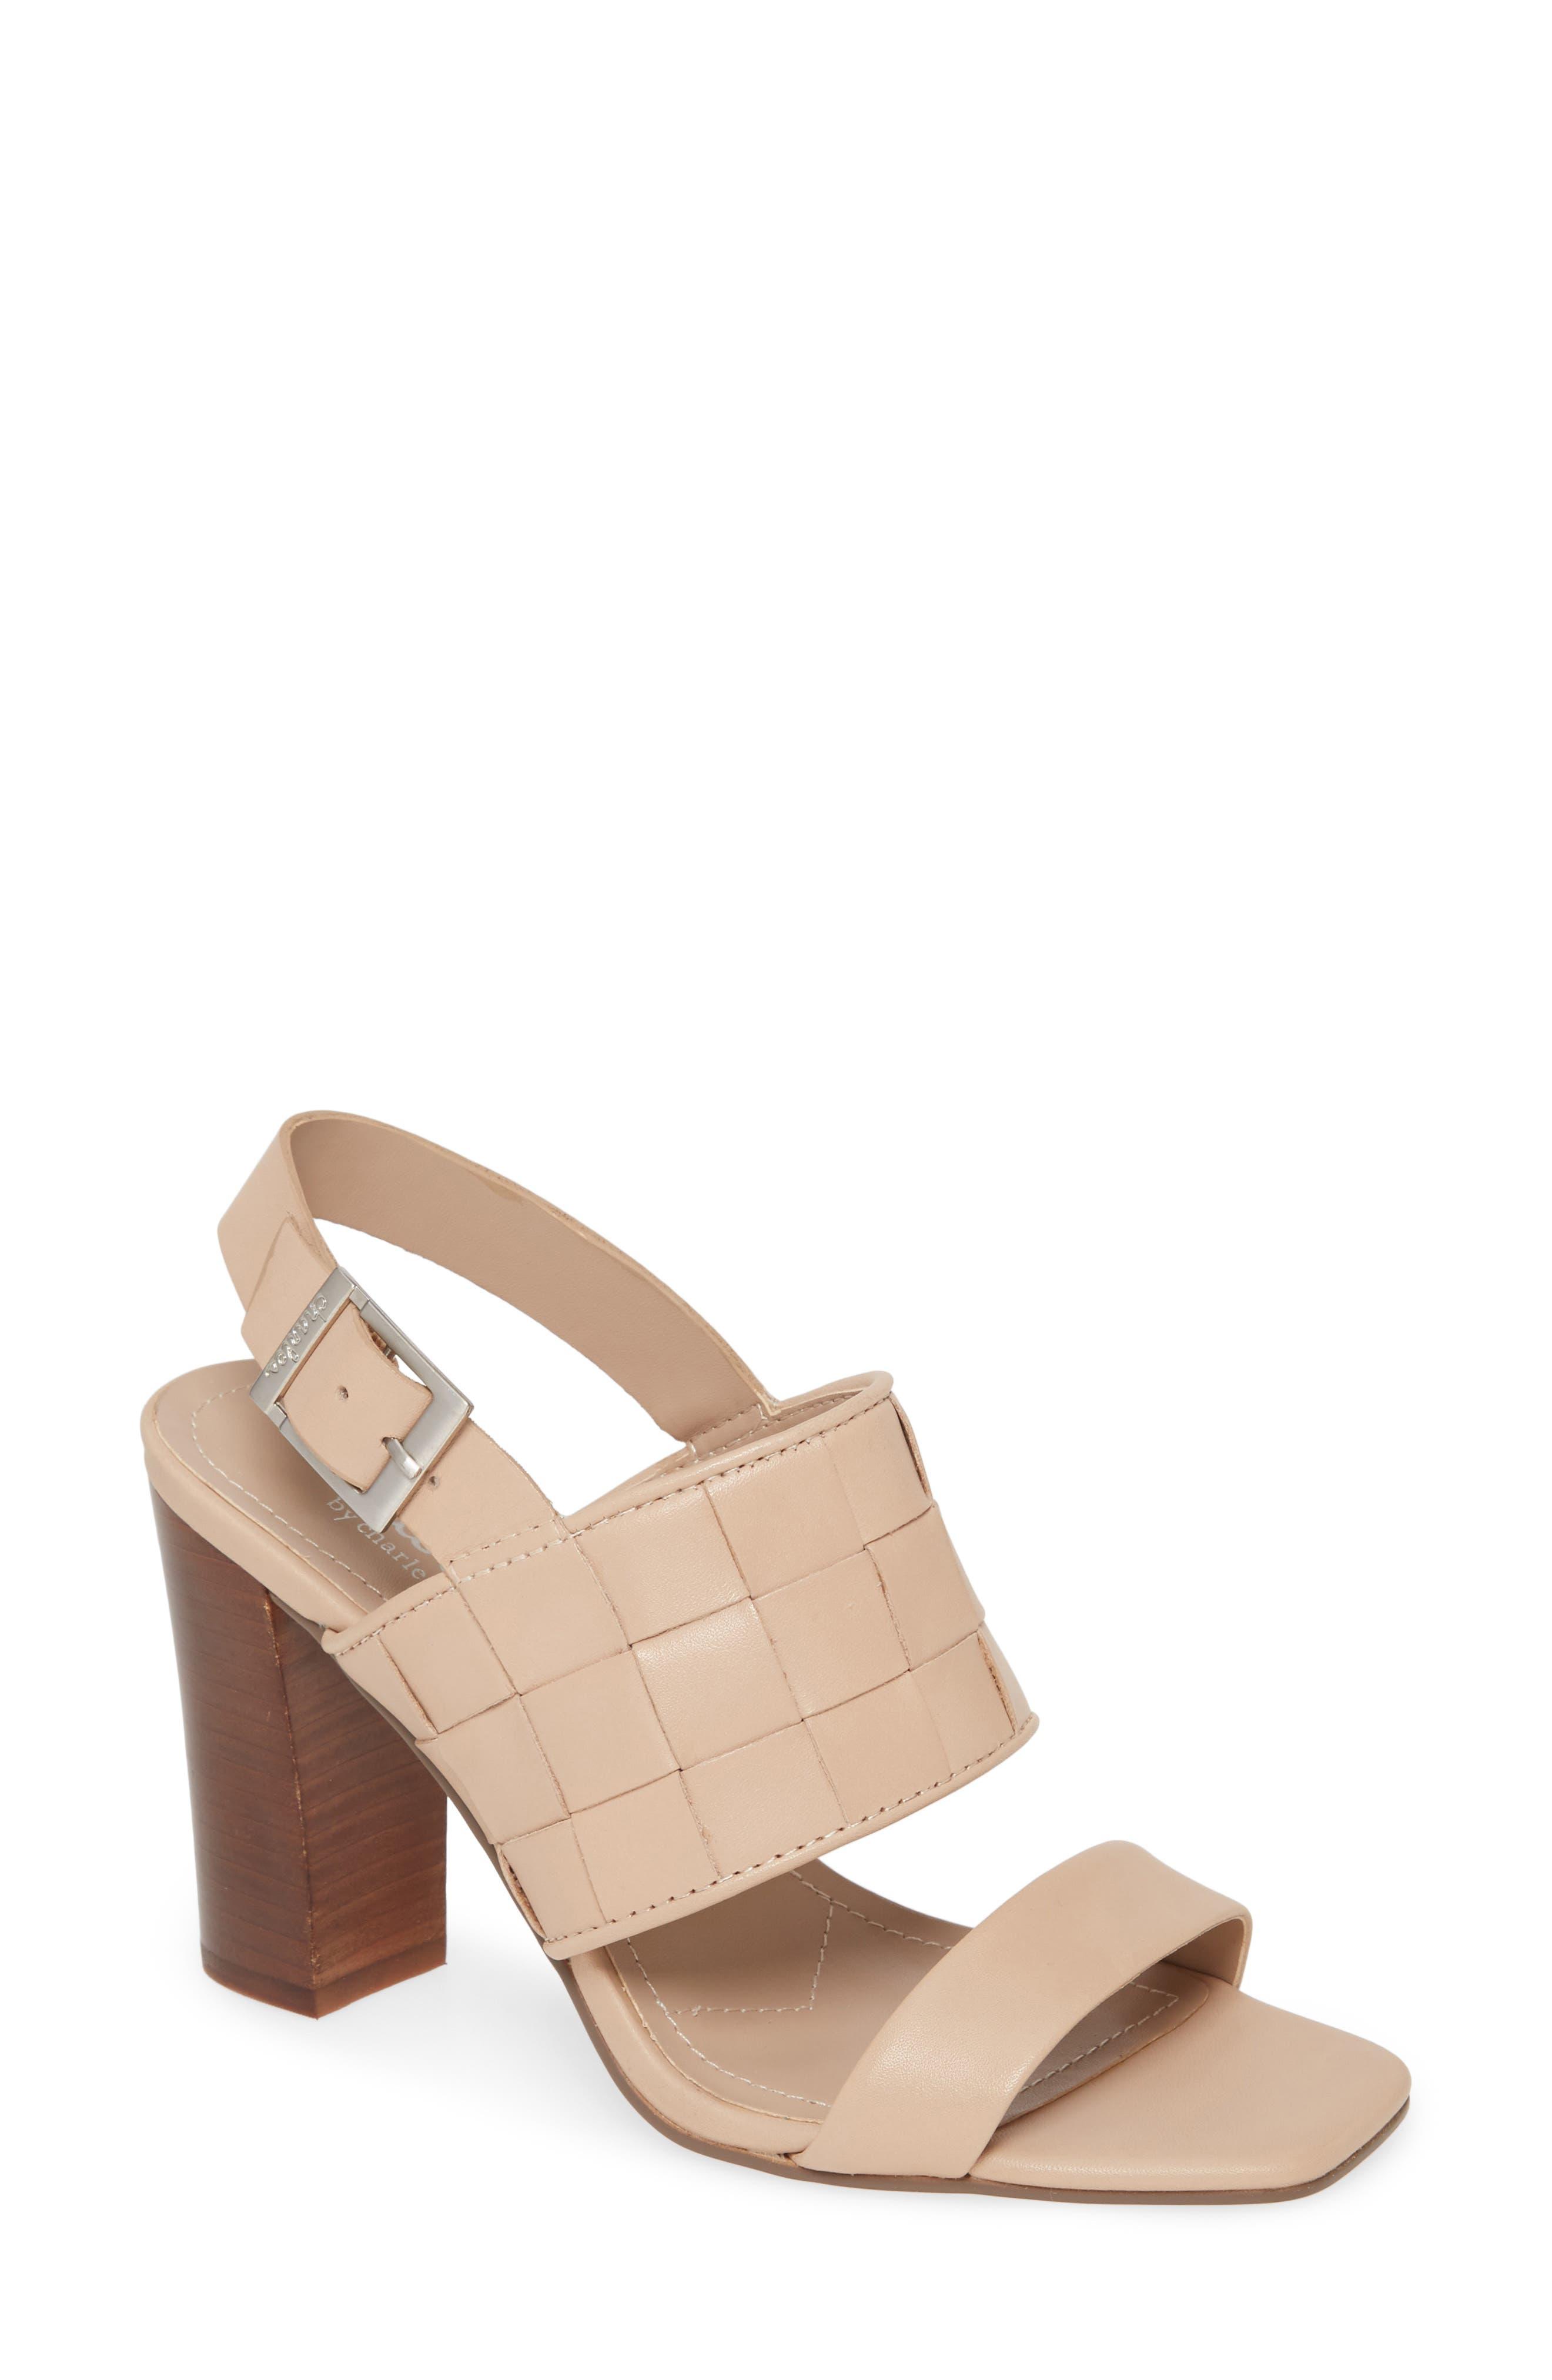 Maison Block Heel Sandal